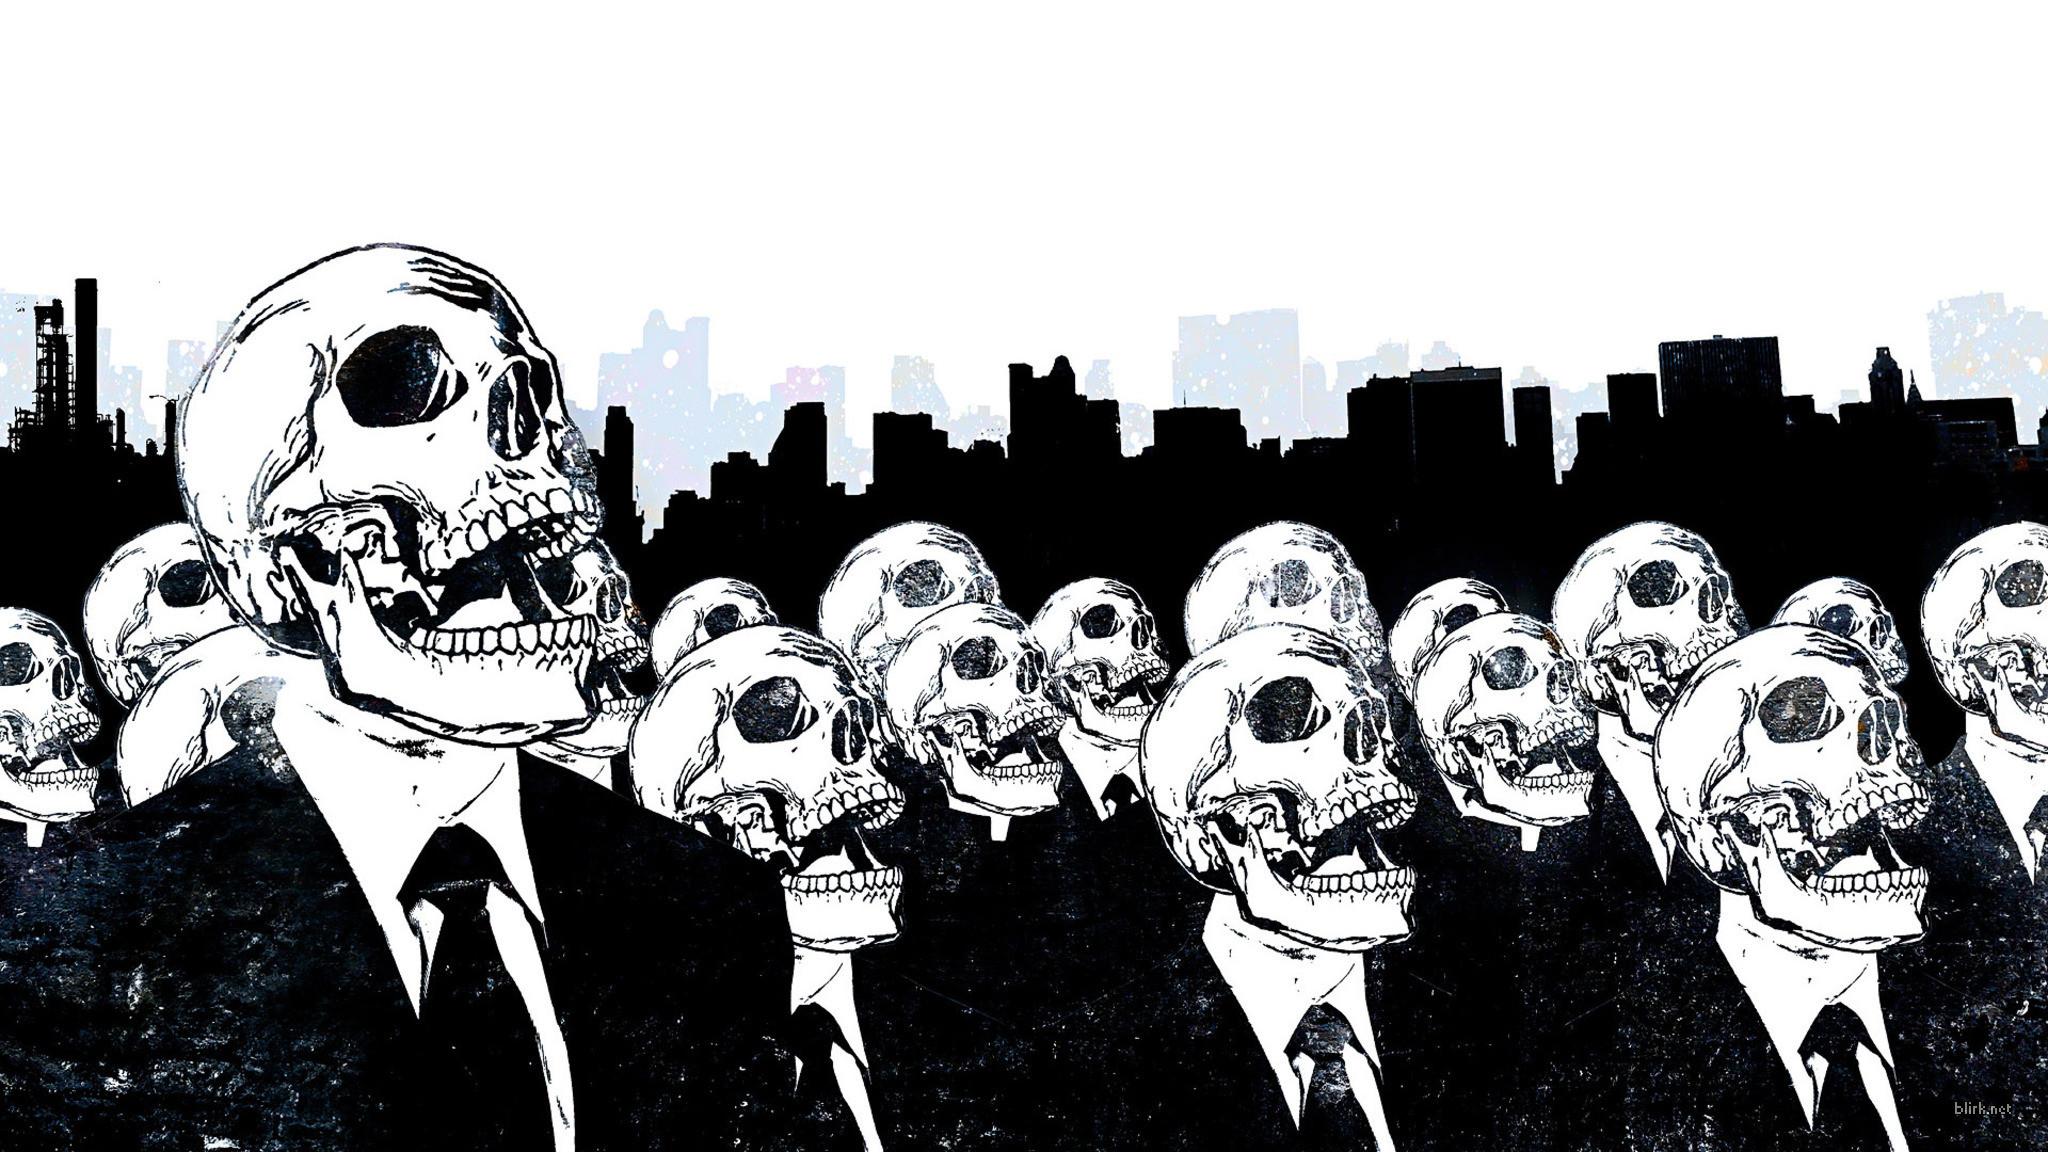 Download Skullpeople 2048x1152 Wallpaper 2048x1152 Wallpoper 385331 2048x1152